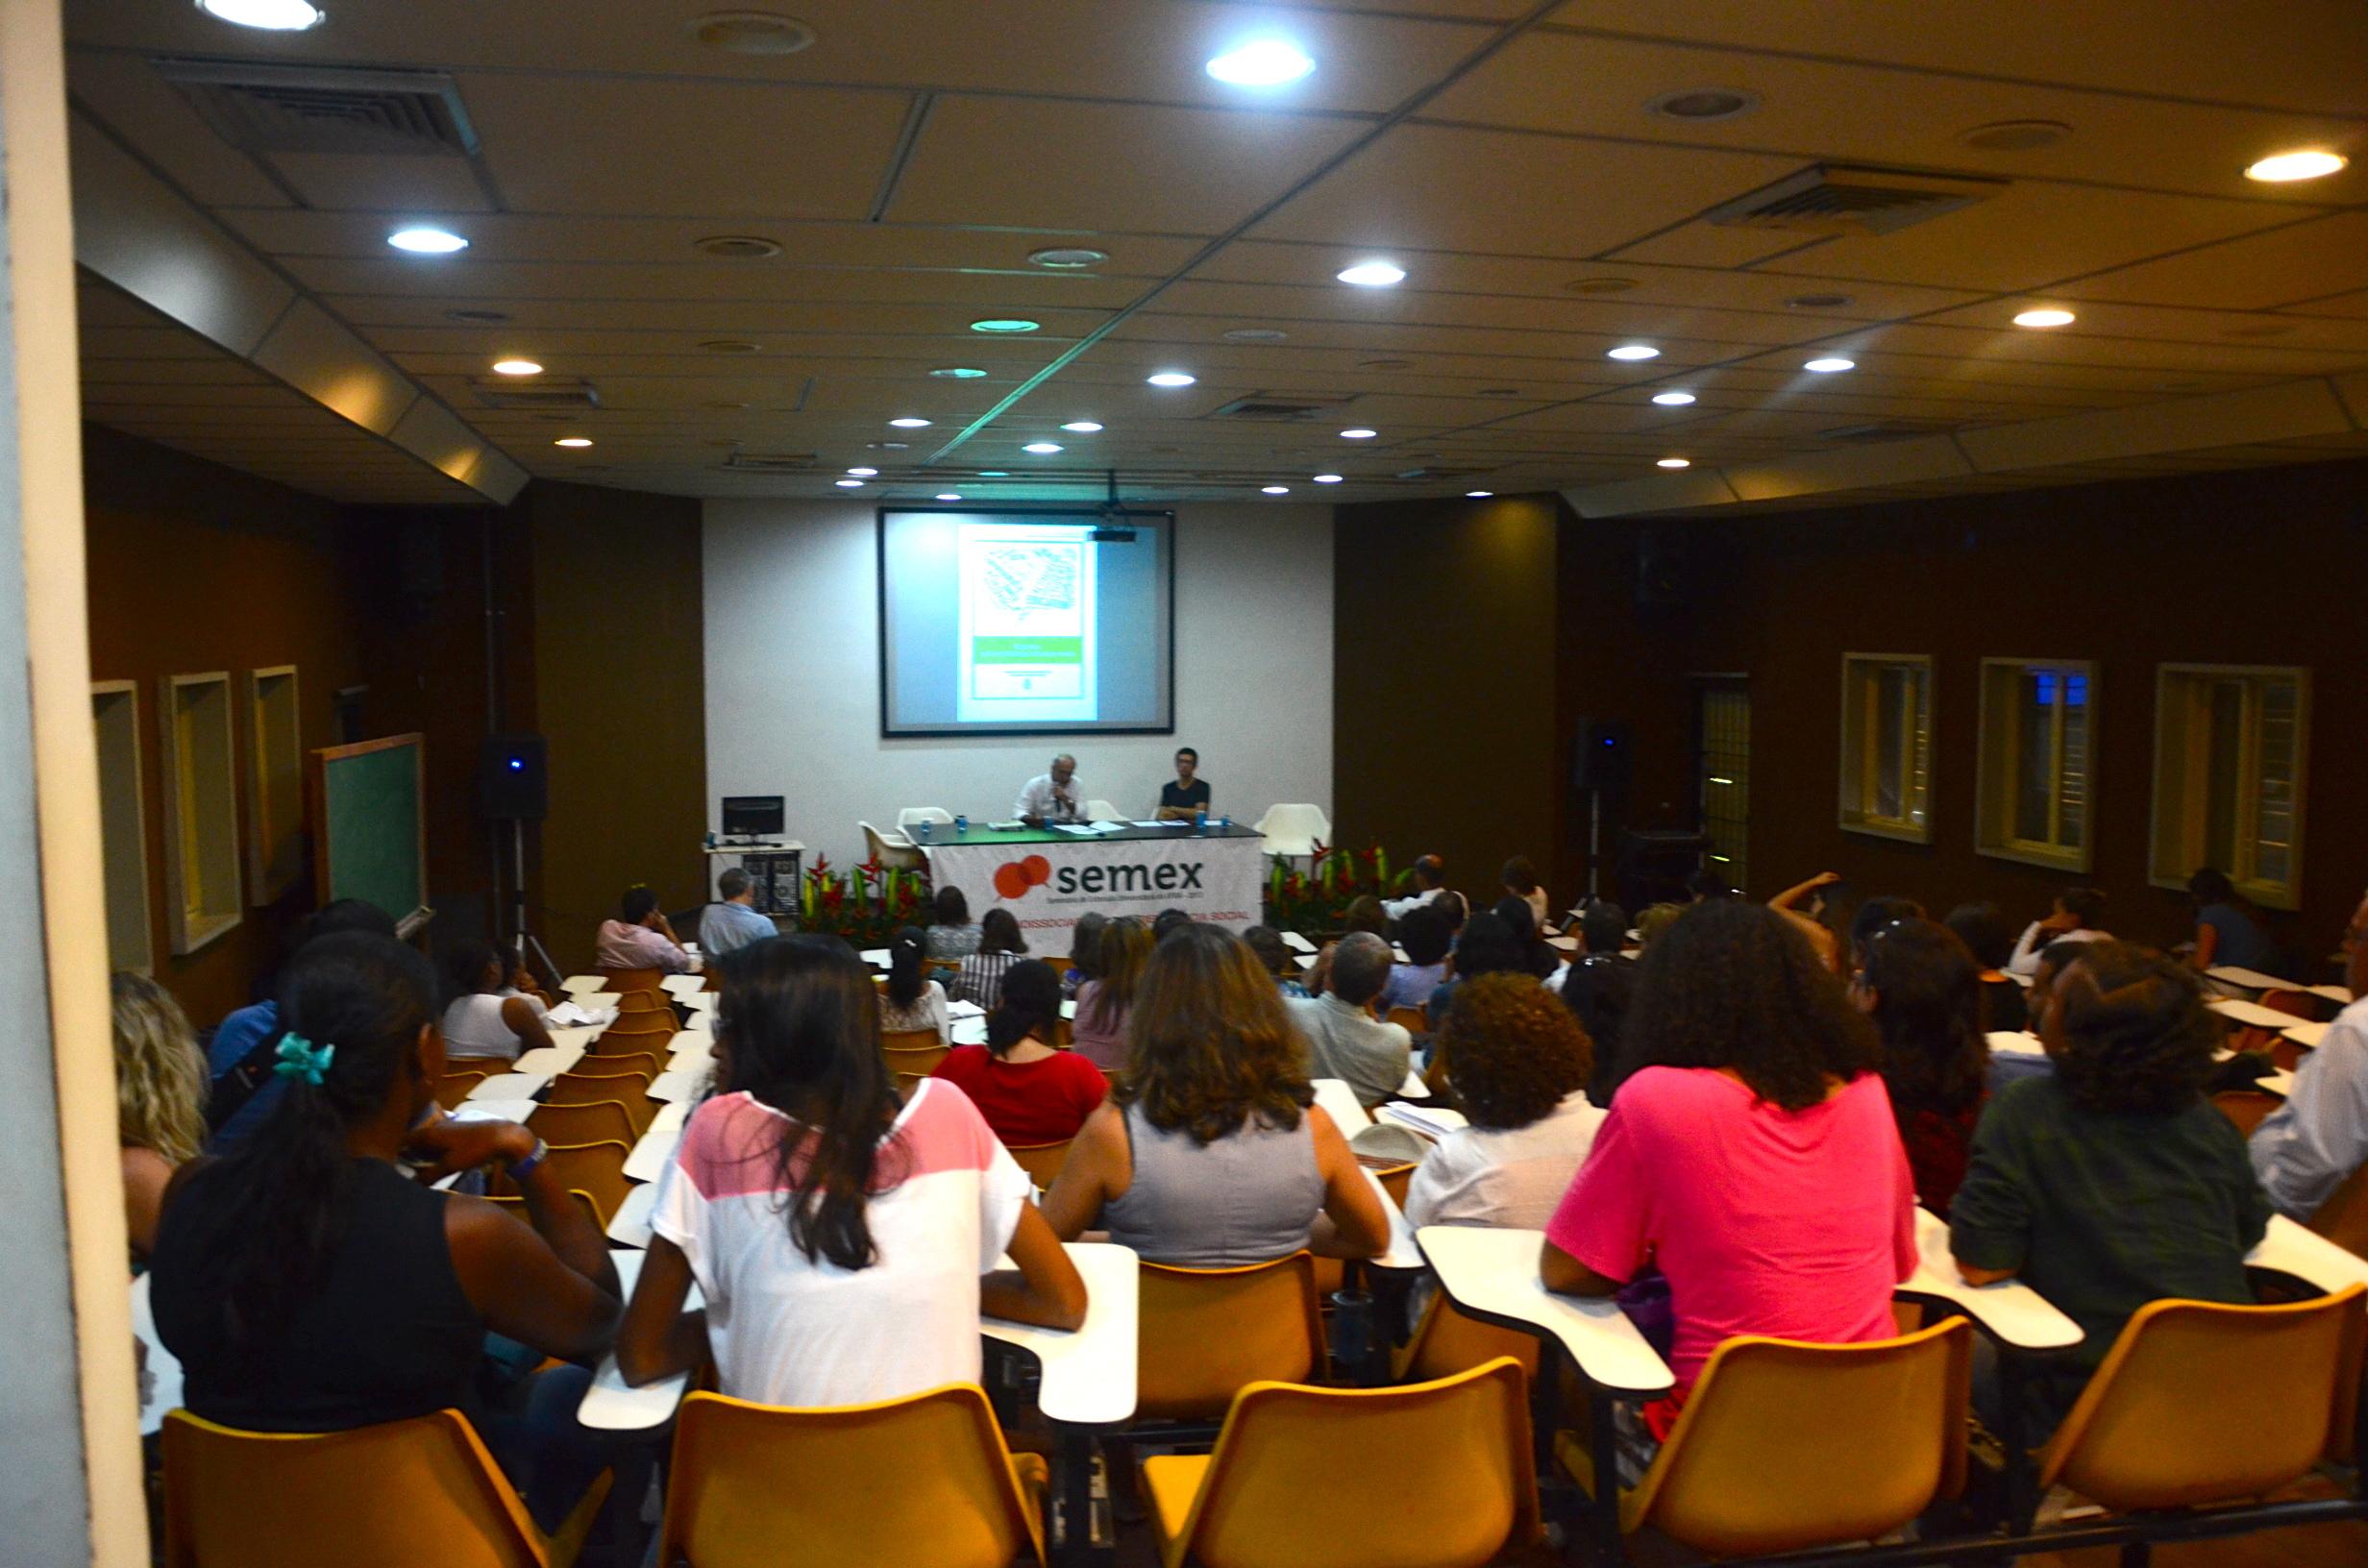 Palestra de abertura do Semex com Jorge Luiz Barbosa. Foto: Lorena Caliman